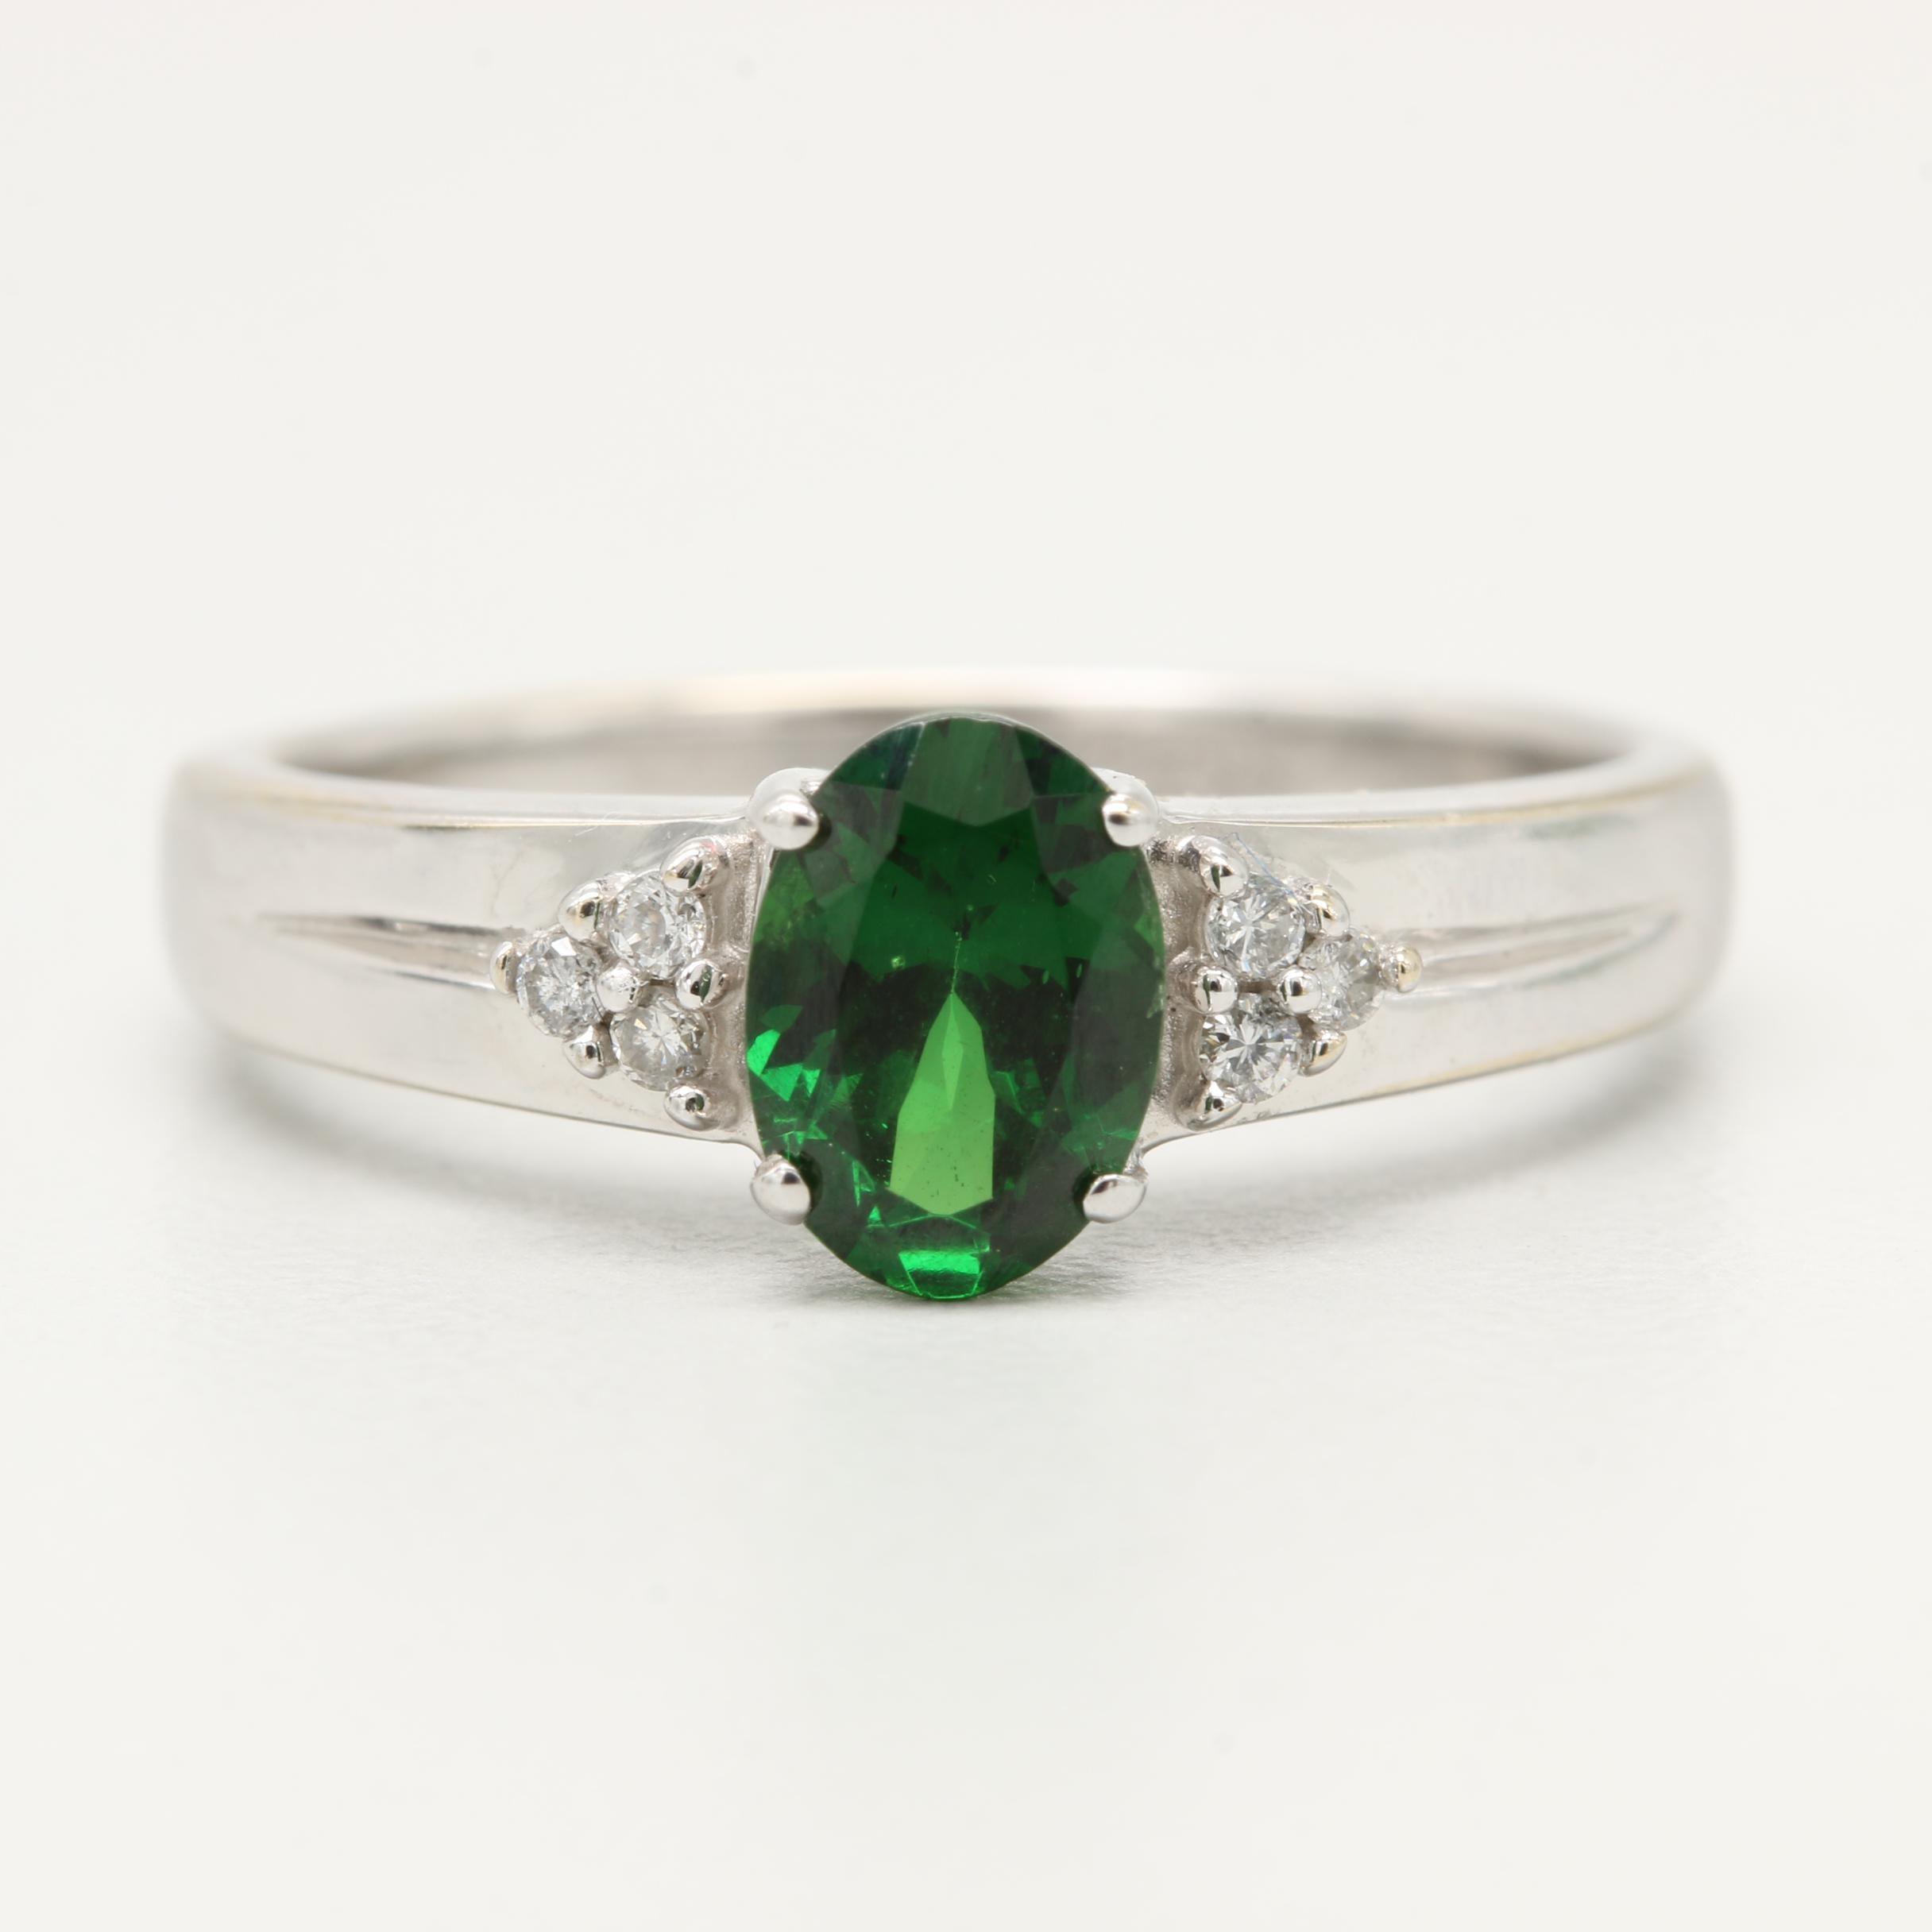 14K White Gold Green Tourmaline and Diamond Ring